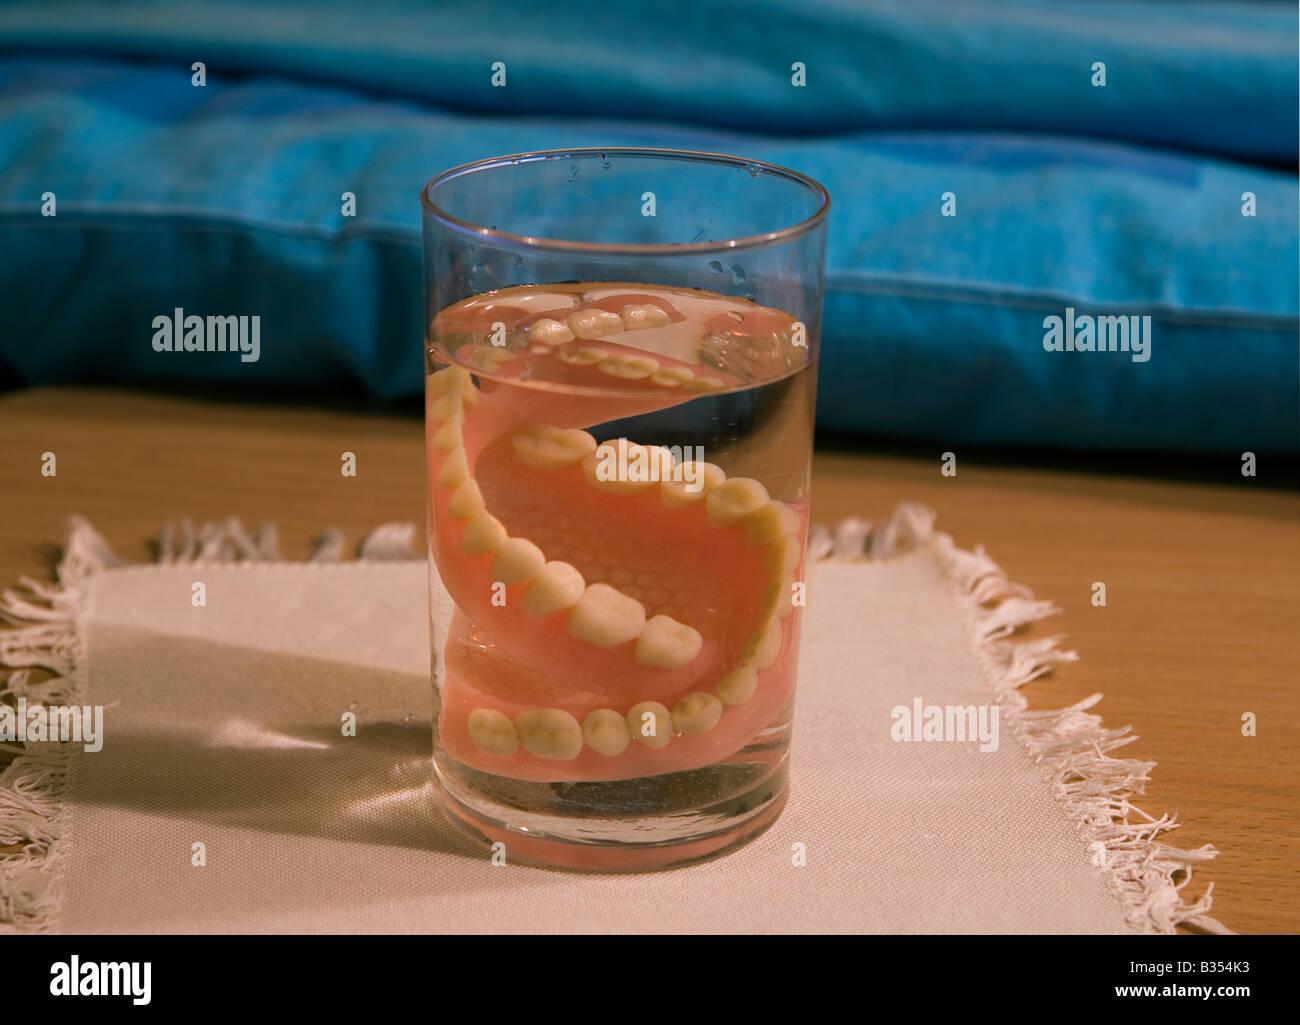 Denture model in glass - Stock Image